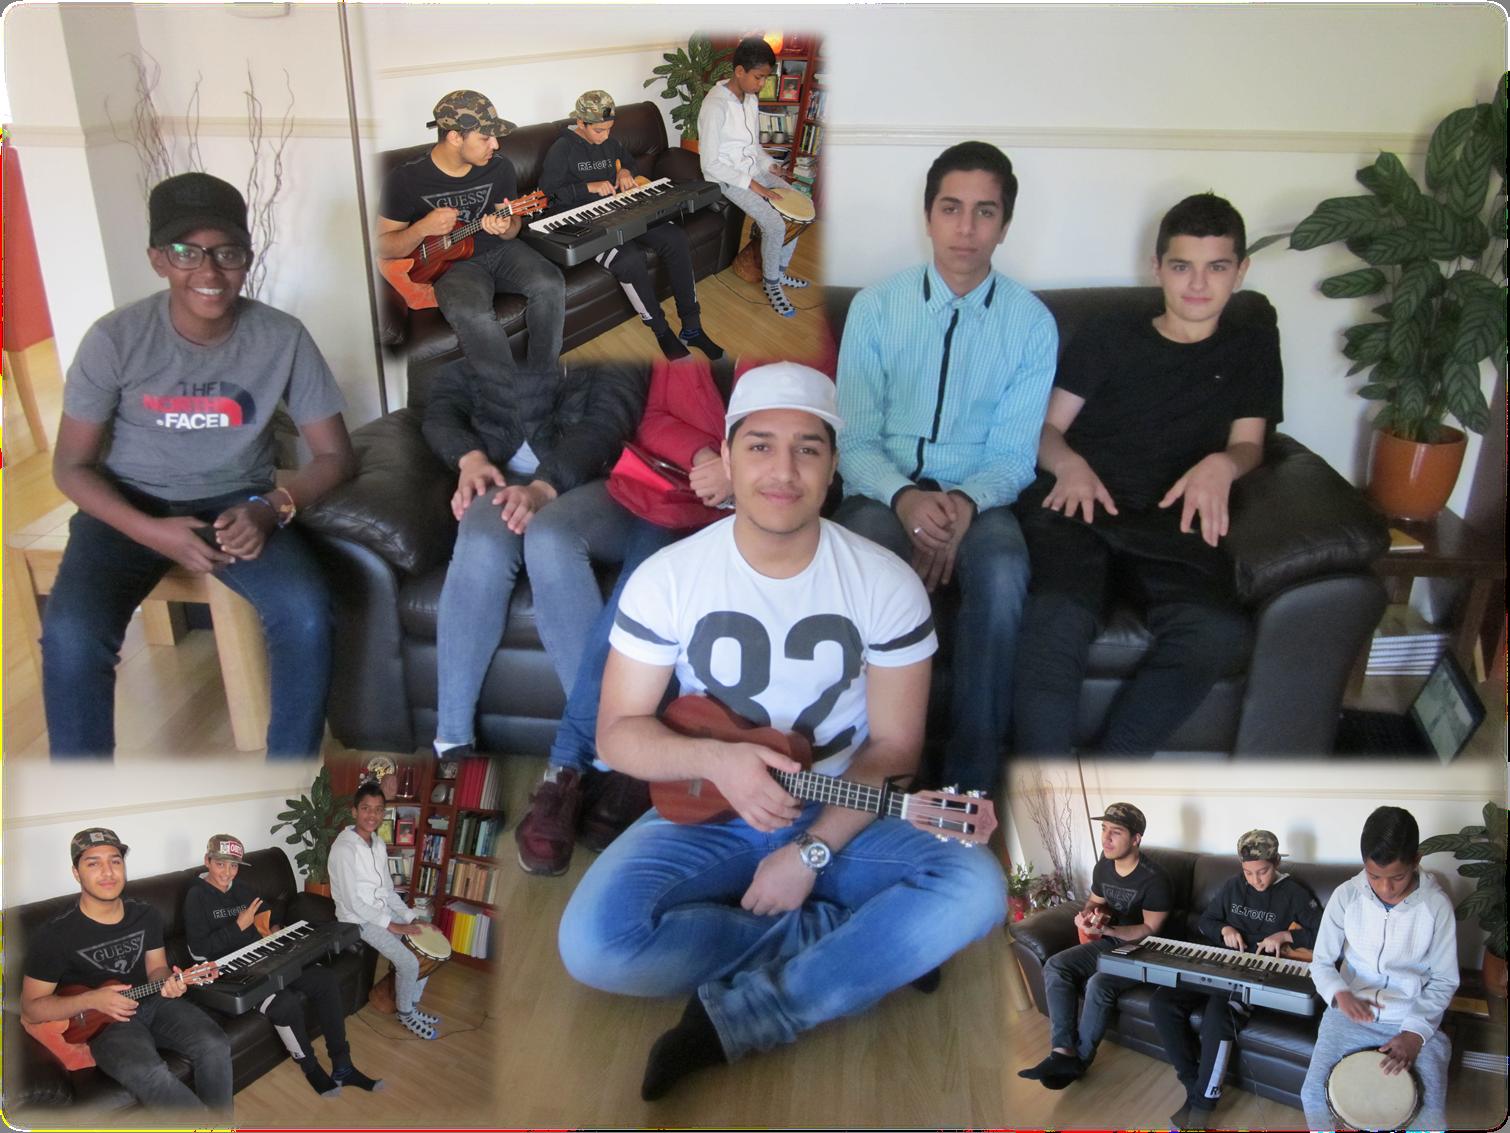 jeugdgroep-in-amersfoort-4e-kwartaal-2016